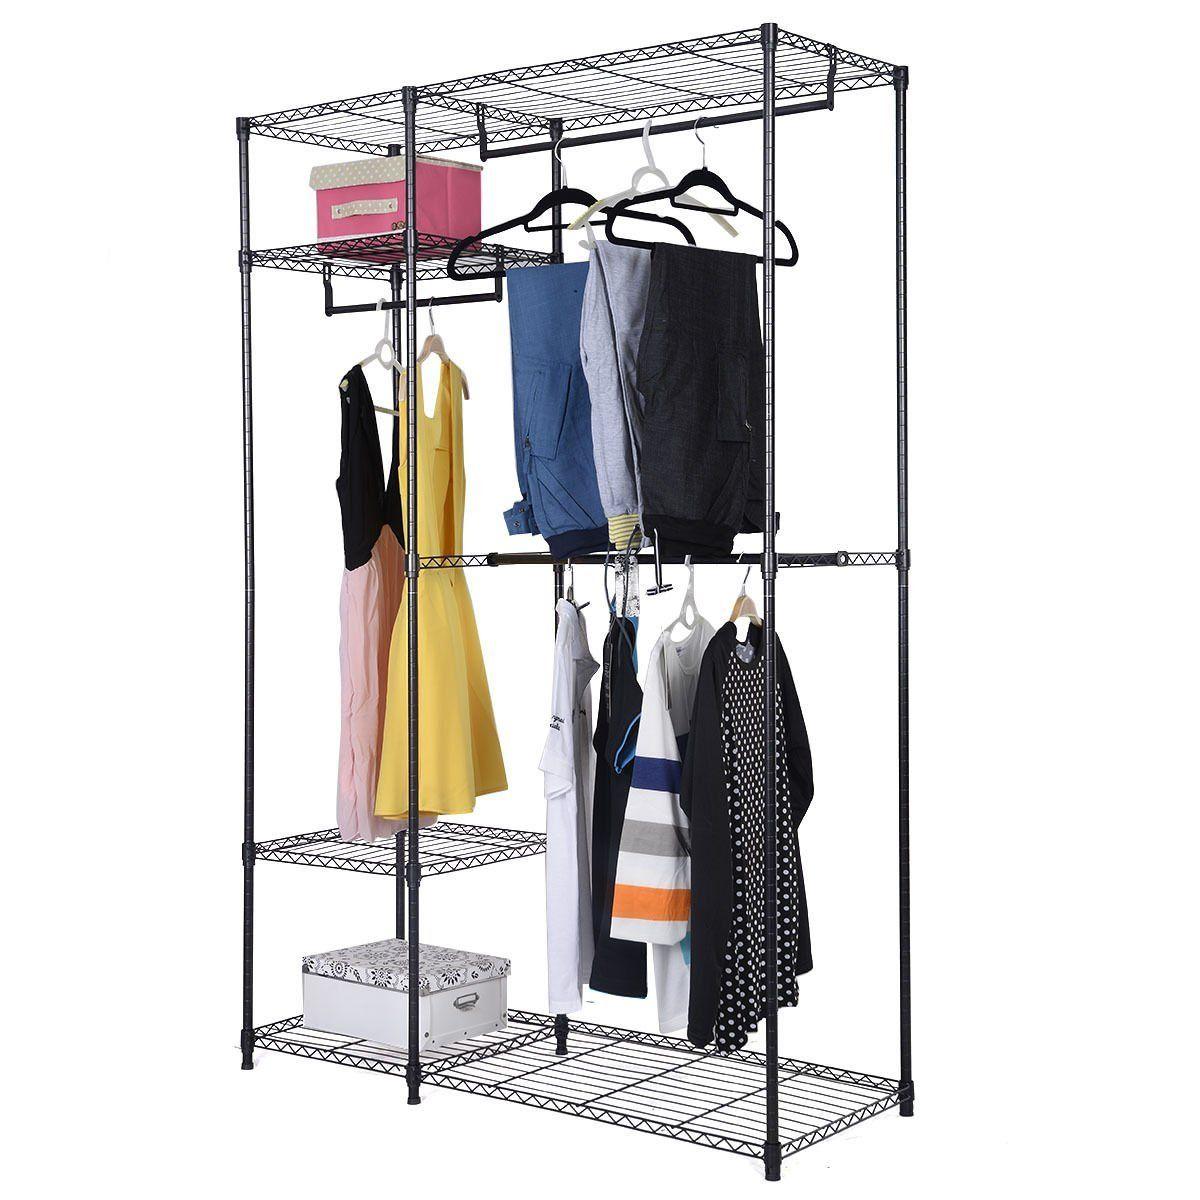 Portable Clothes Wardrobe Garment Rack Home Closet Hanger Storage Organizer